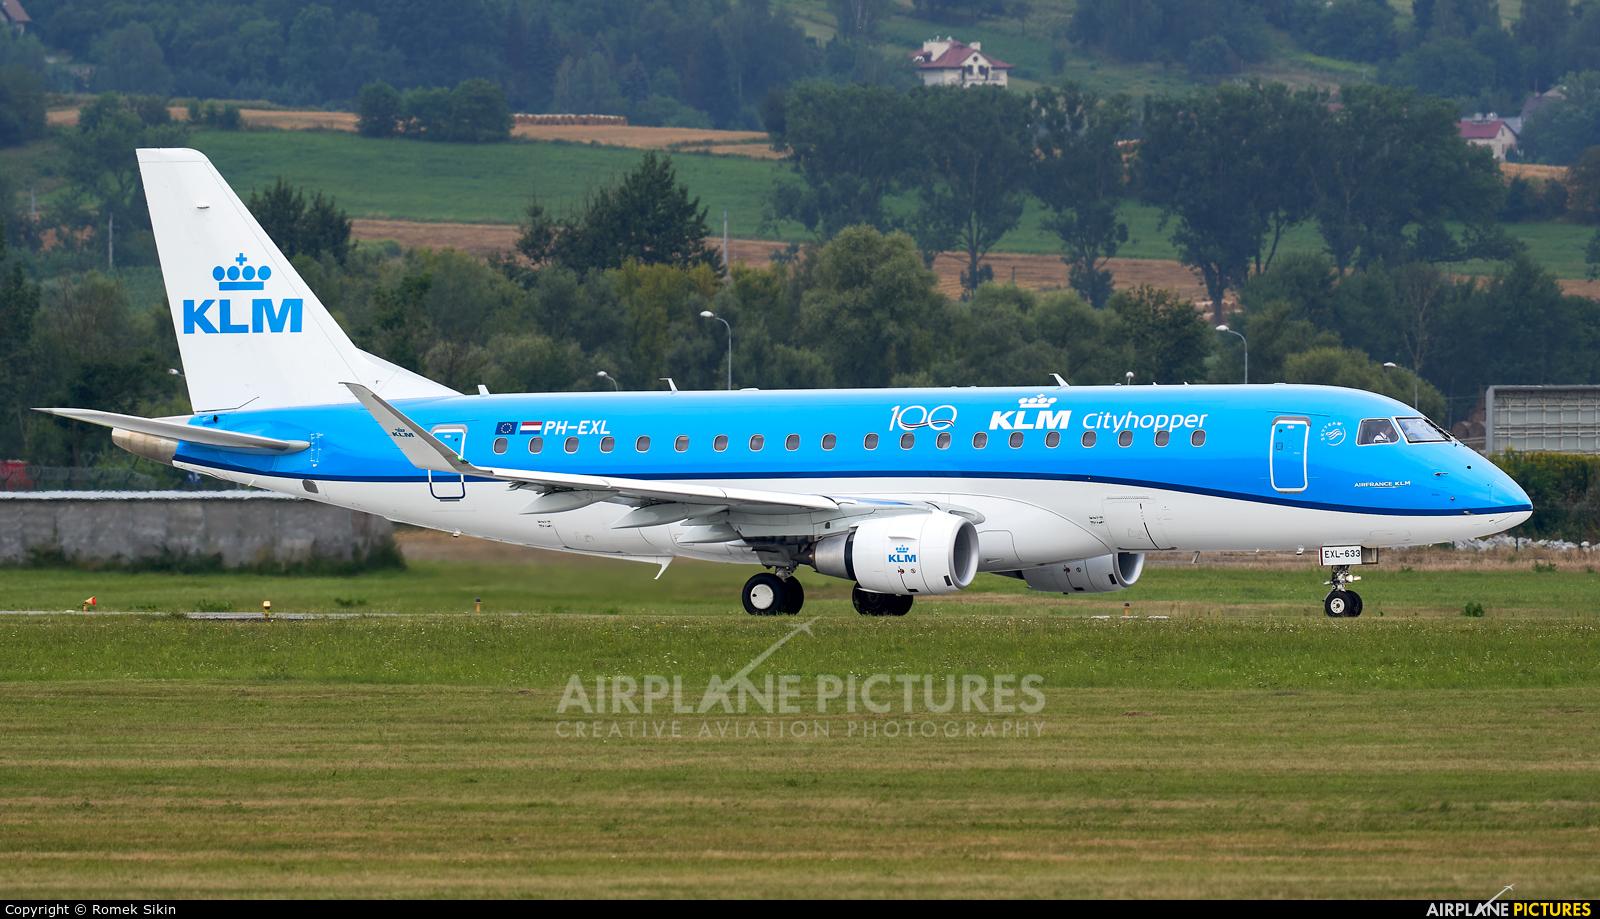 KLM Cityhopper PH-EXL aircraft at Kraków - John Paul II Intl